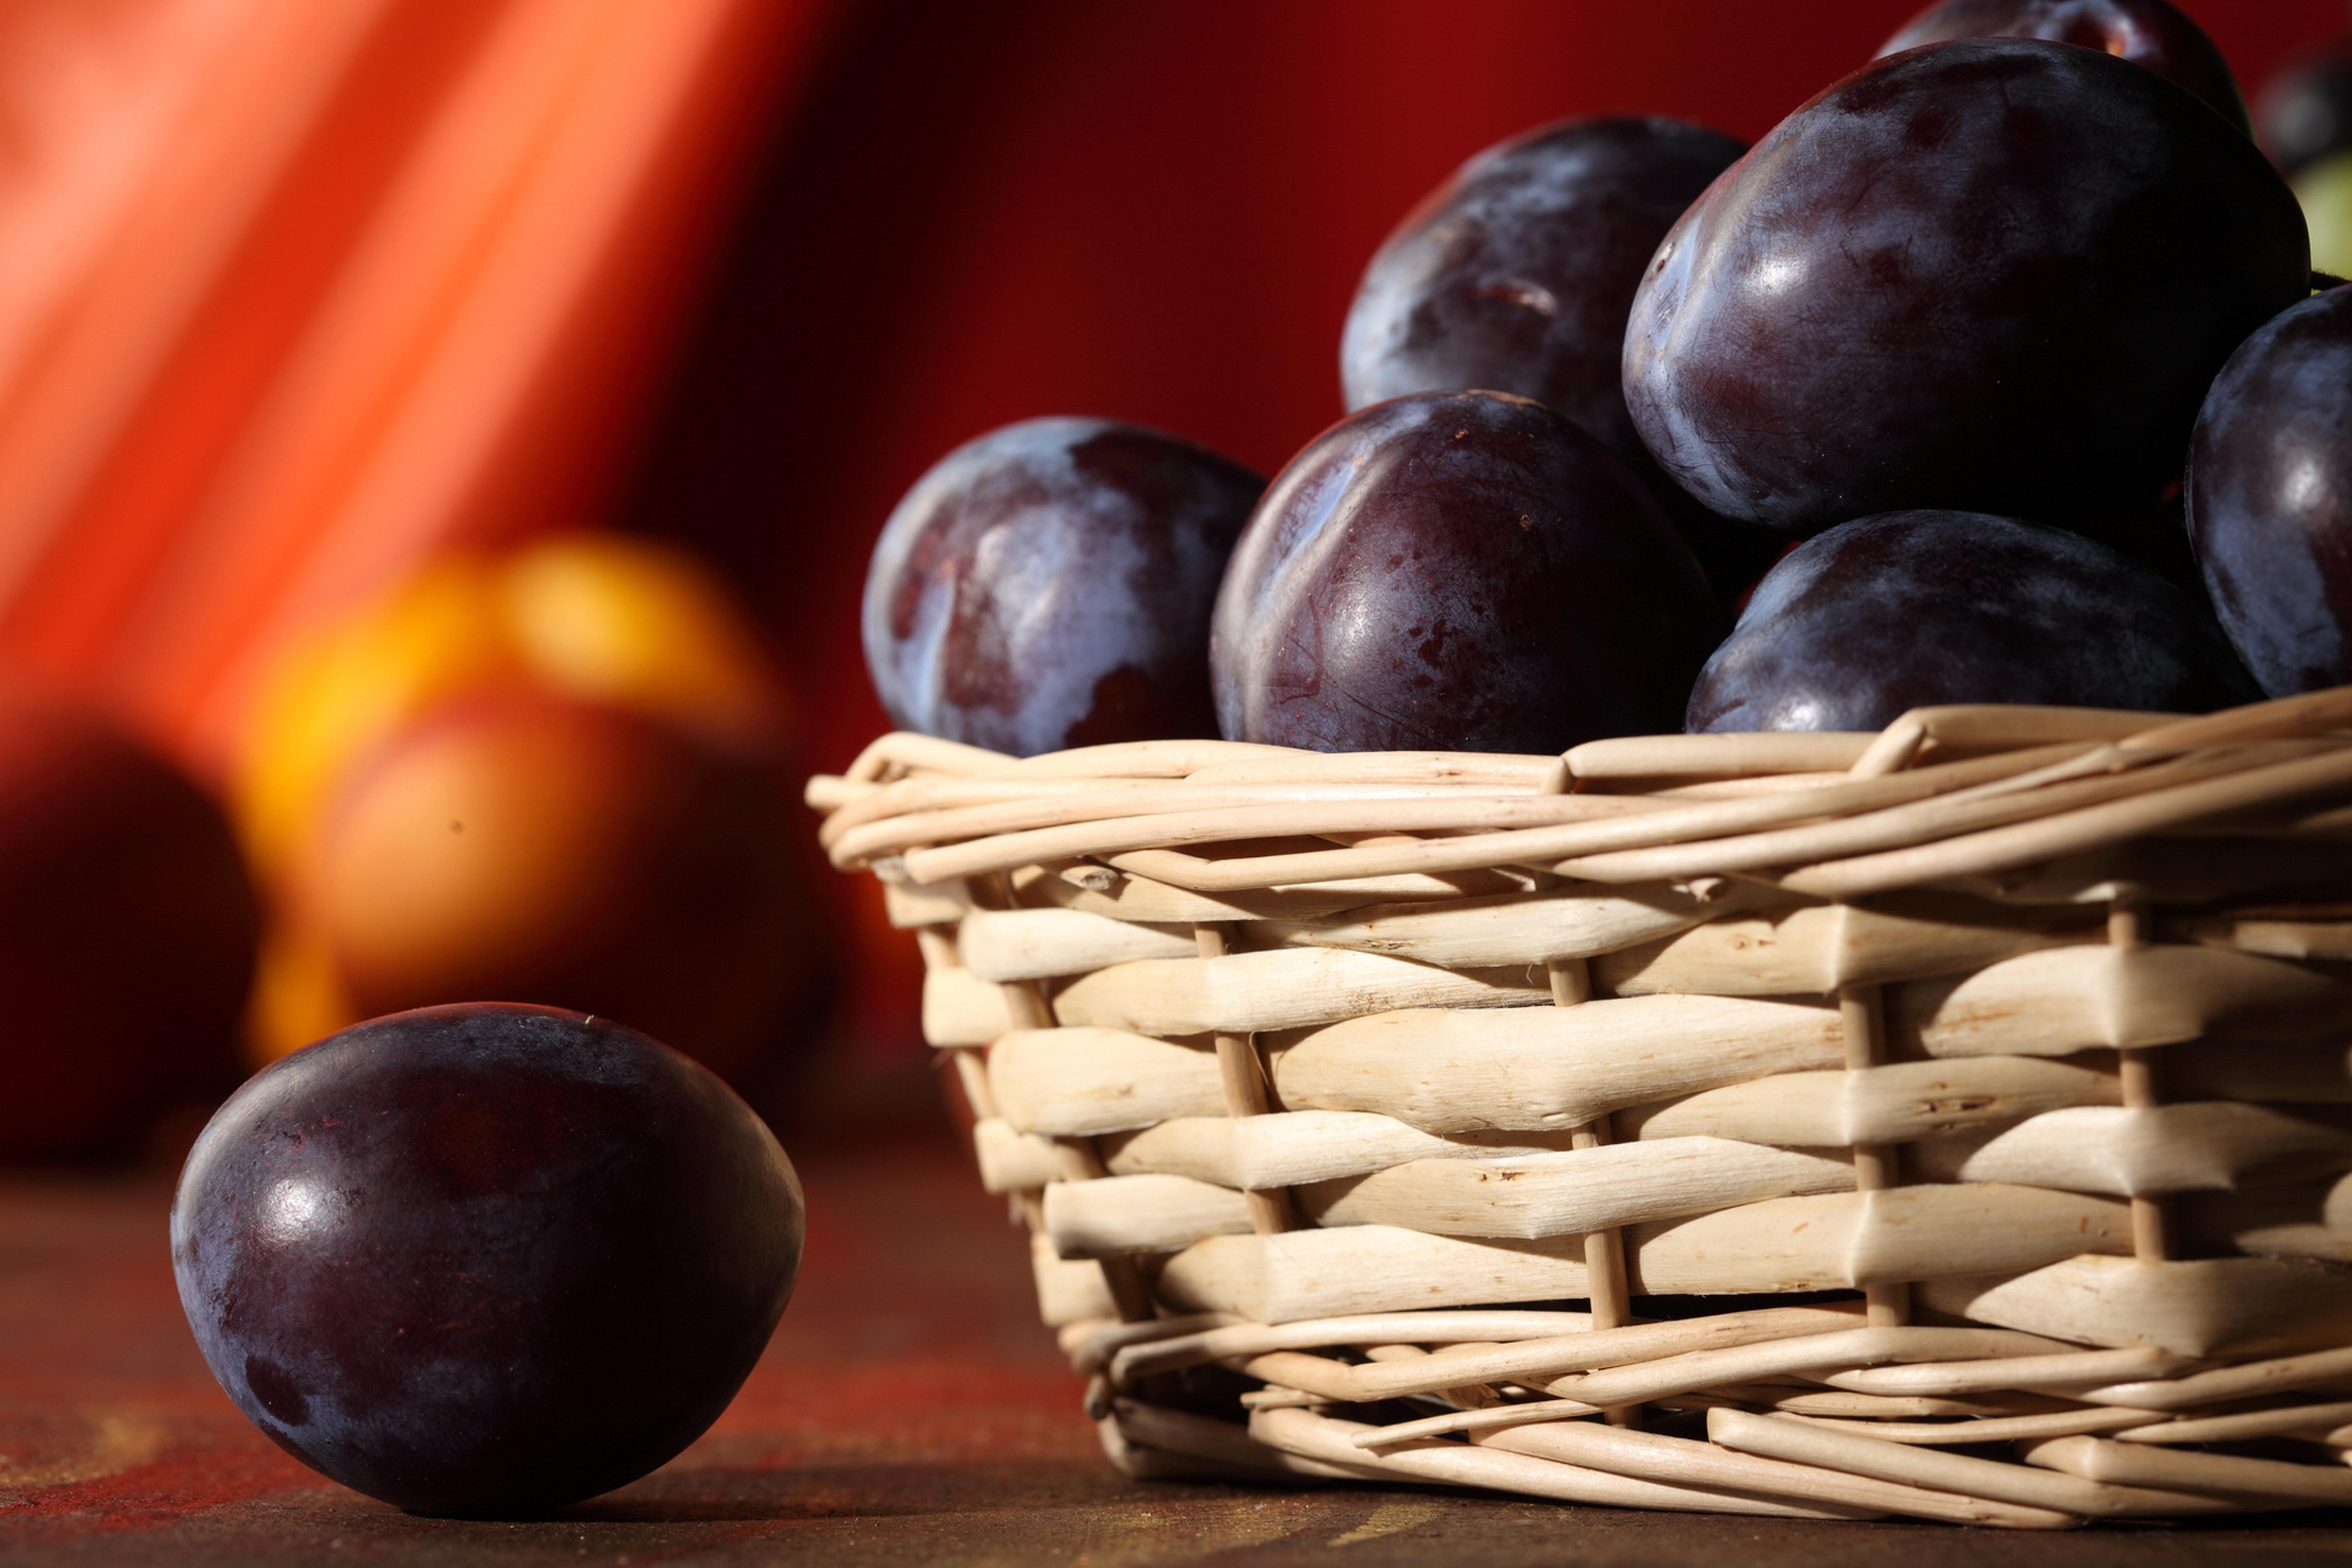 Wallpaper Food Fruit Basket Produce Land Plant Flowering